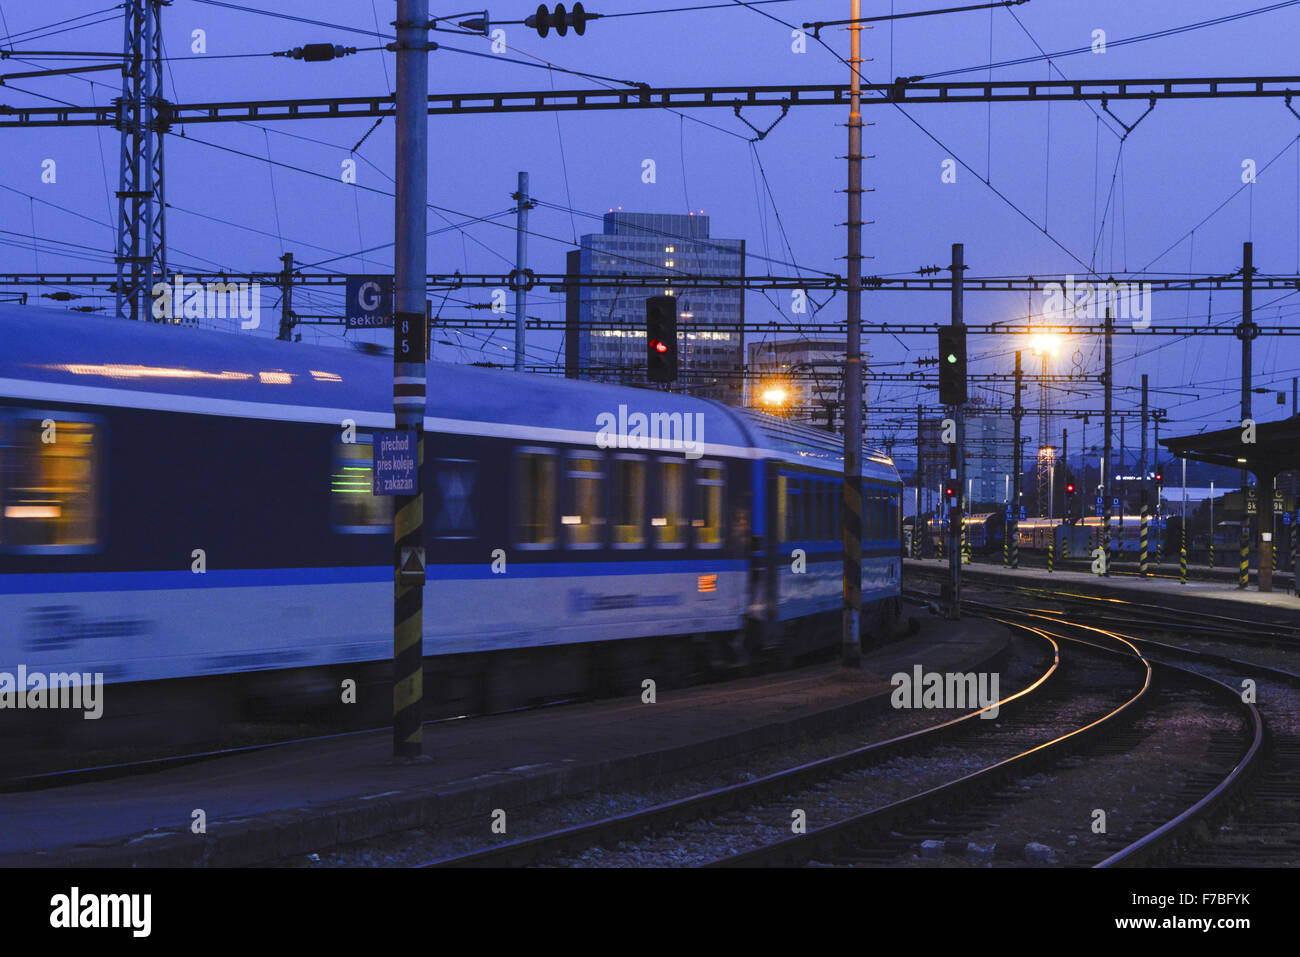 Brno, railway station, Czech Republic, Southern Morava - Stock Image